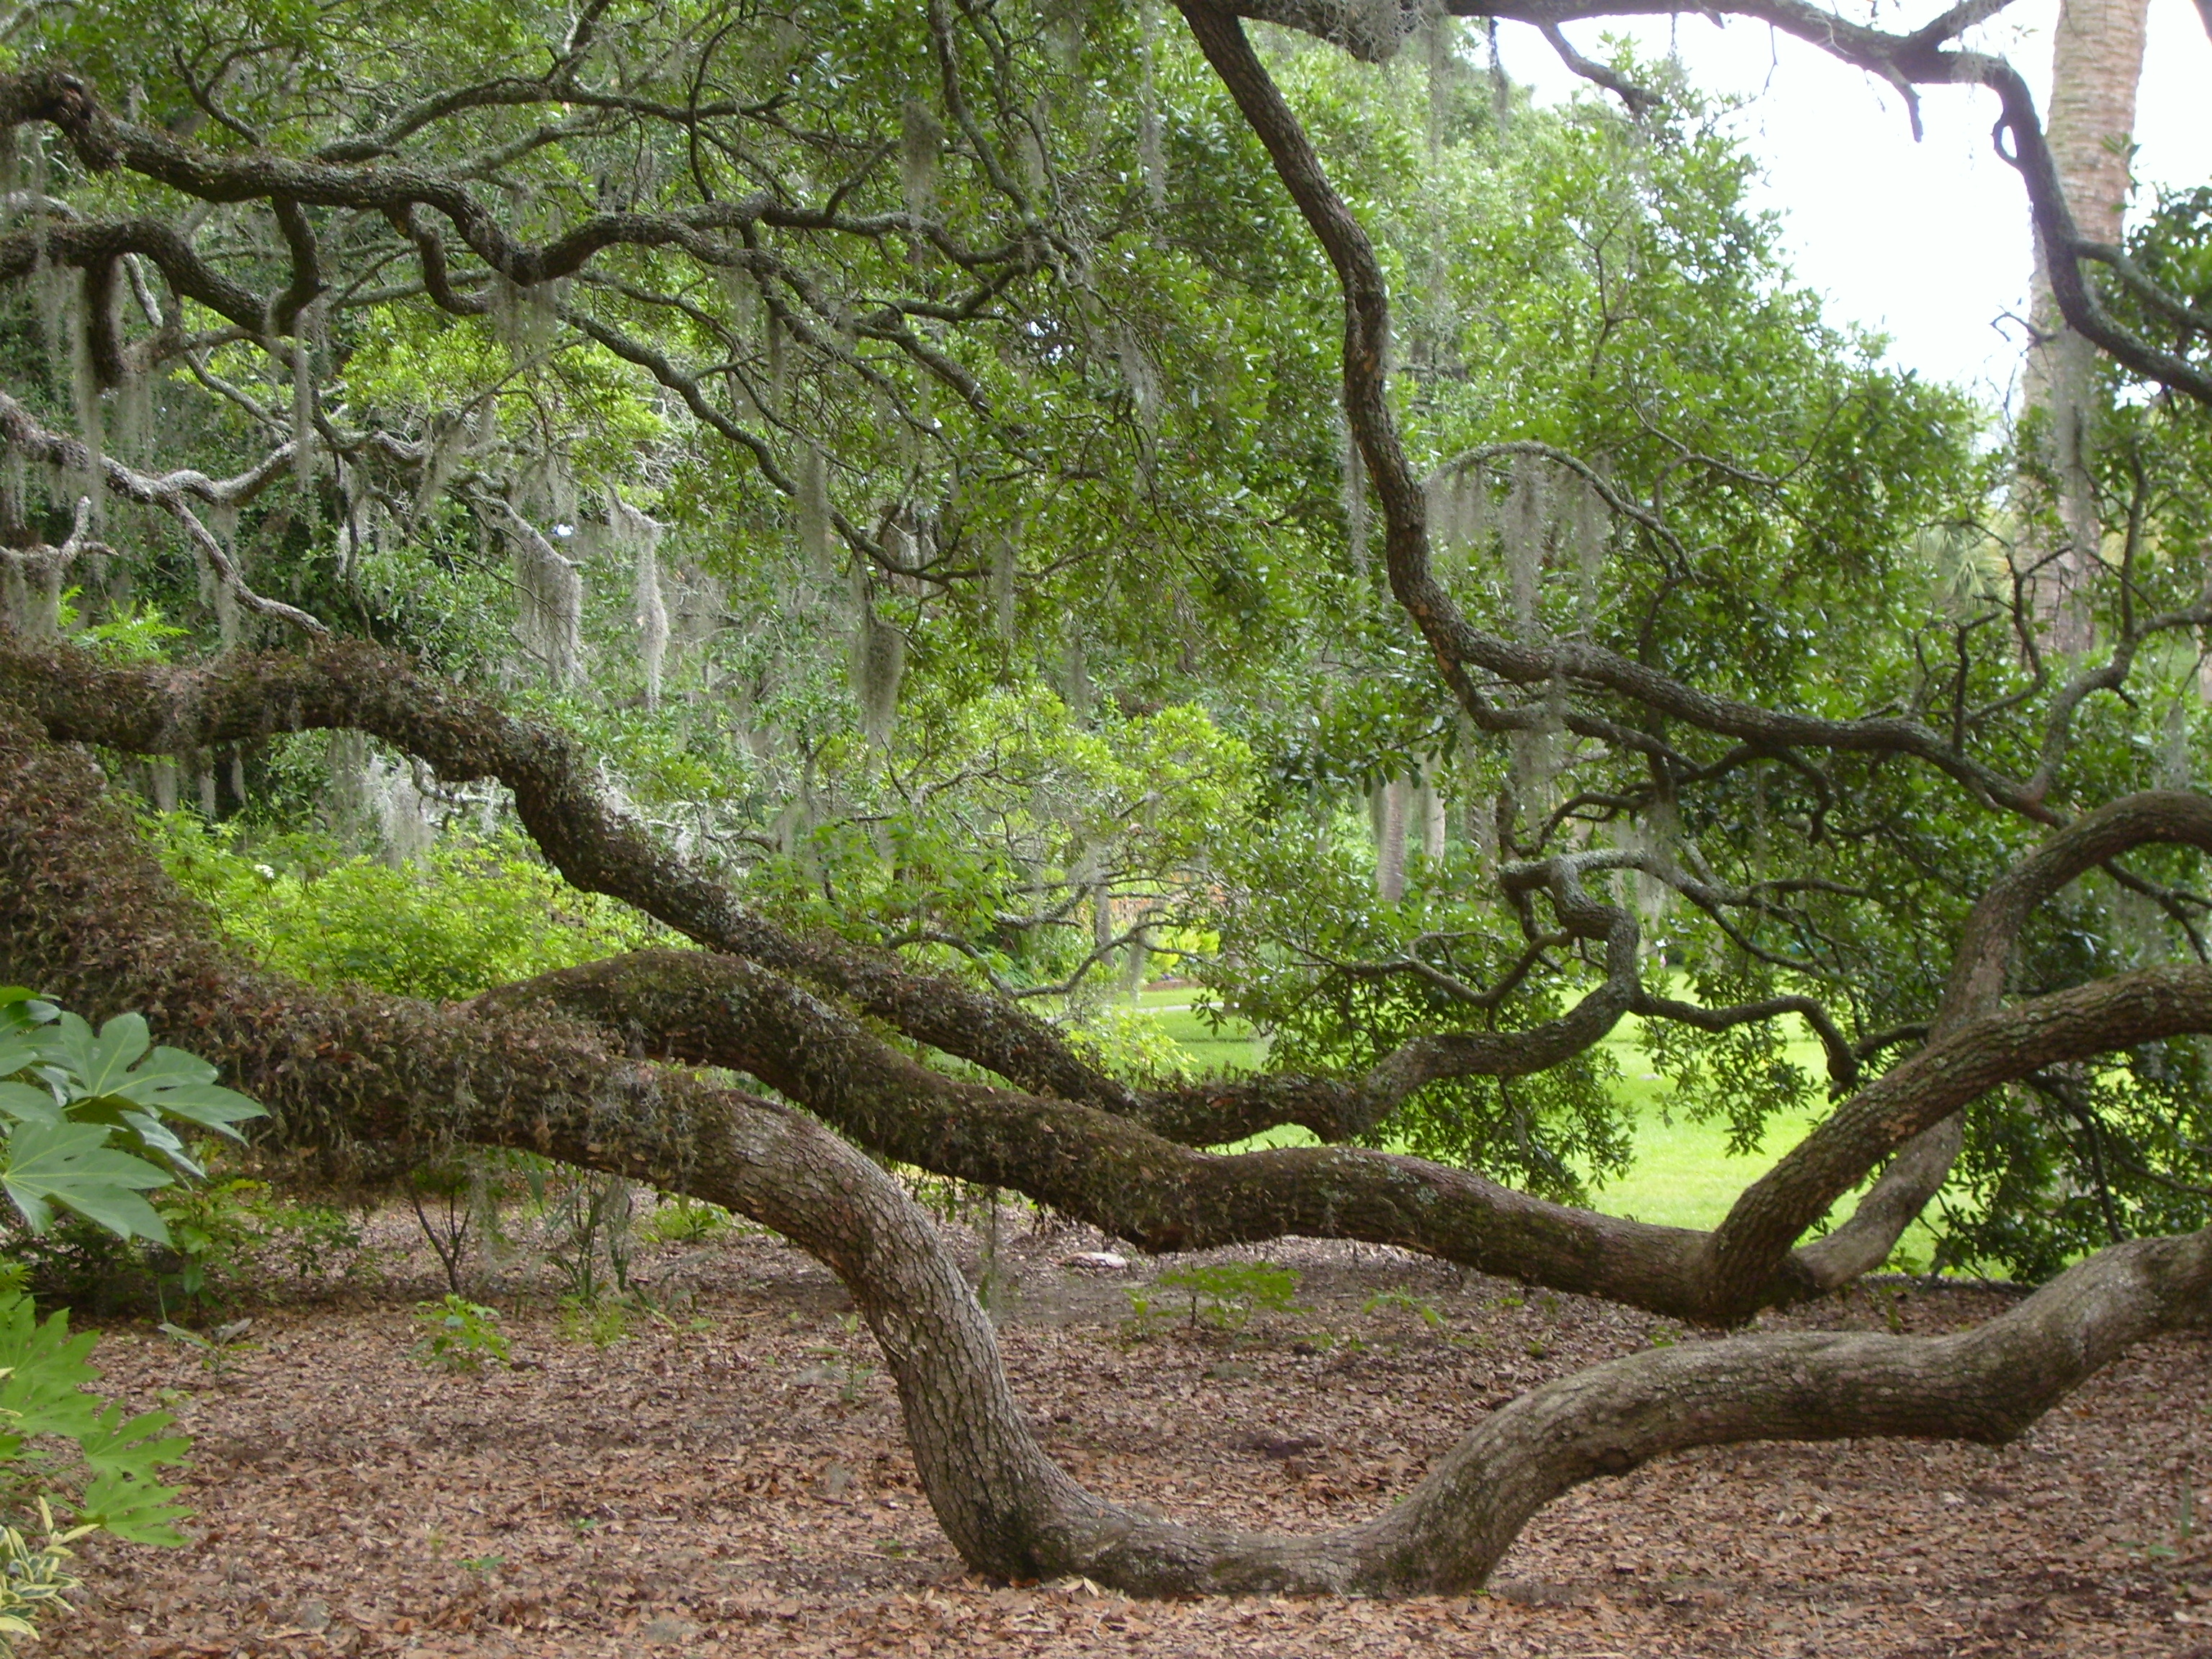 verdant overgrowth